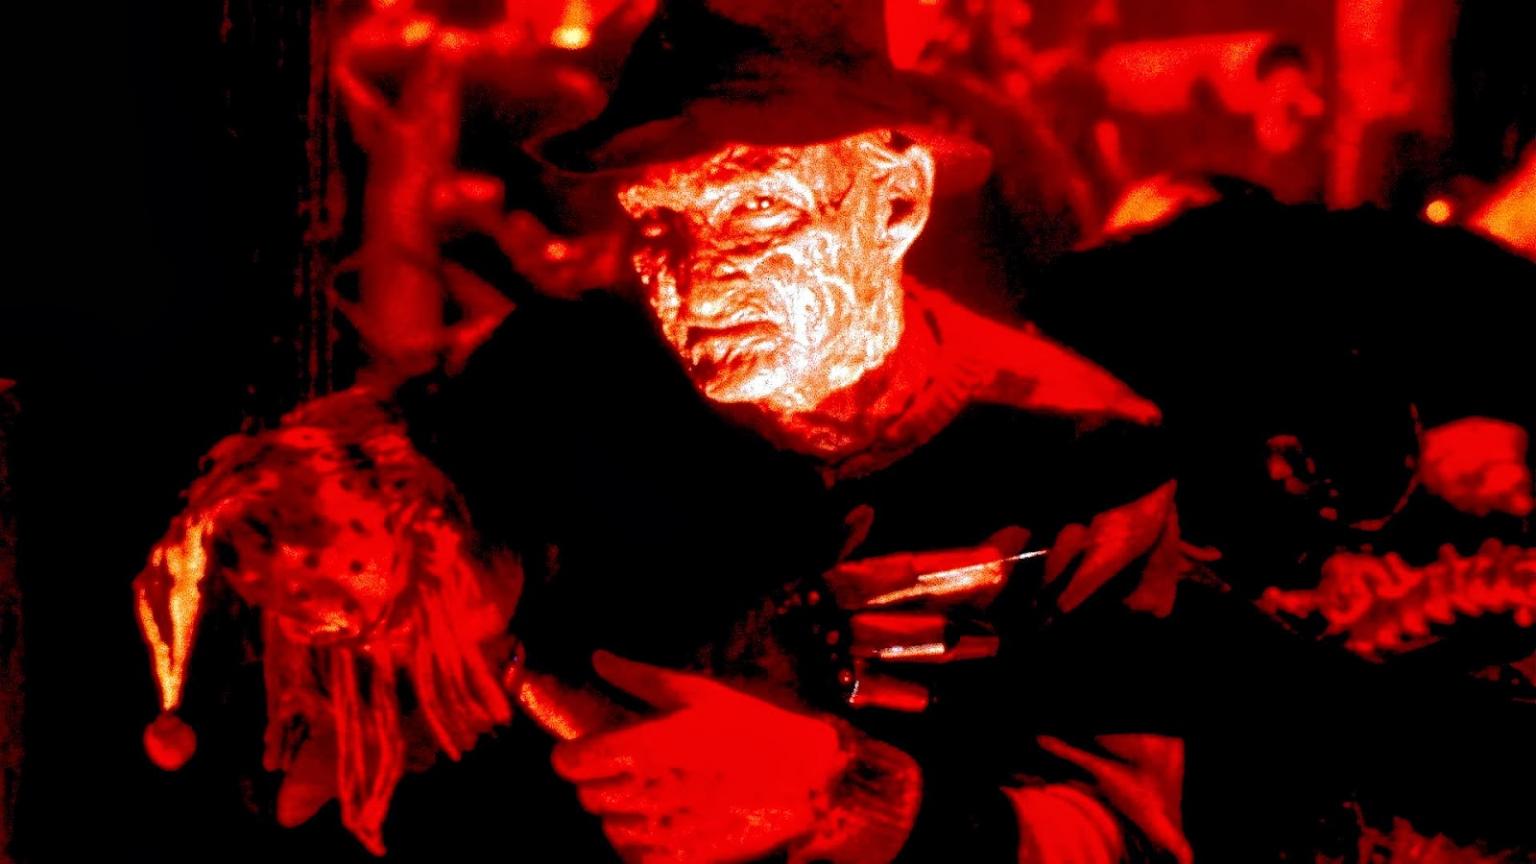 Freddy Krueger Wallpaper Horror Wallpapers Quotekocom 1600x900